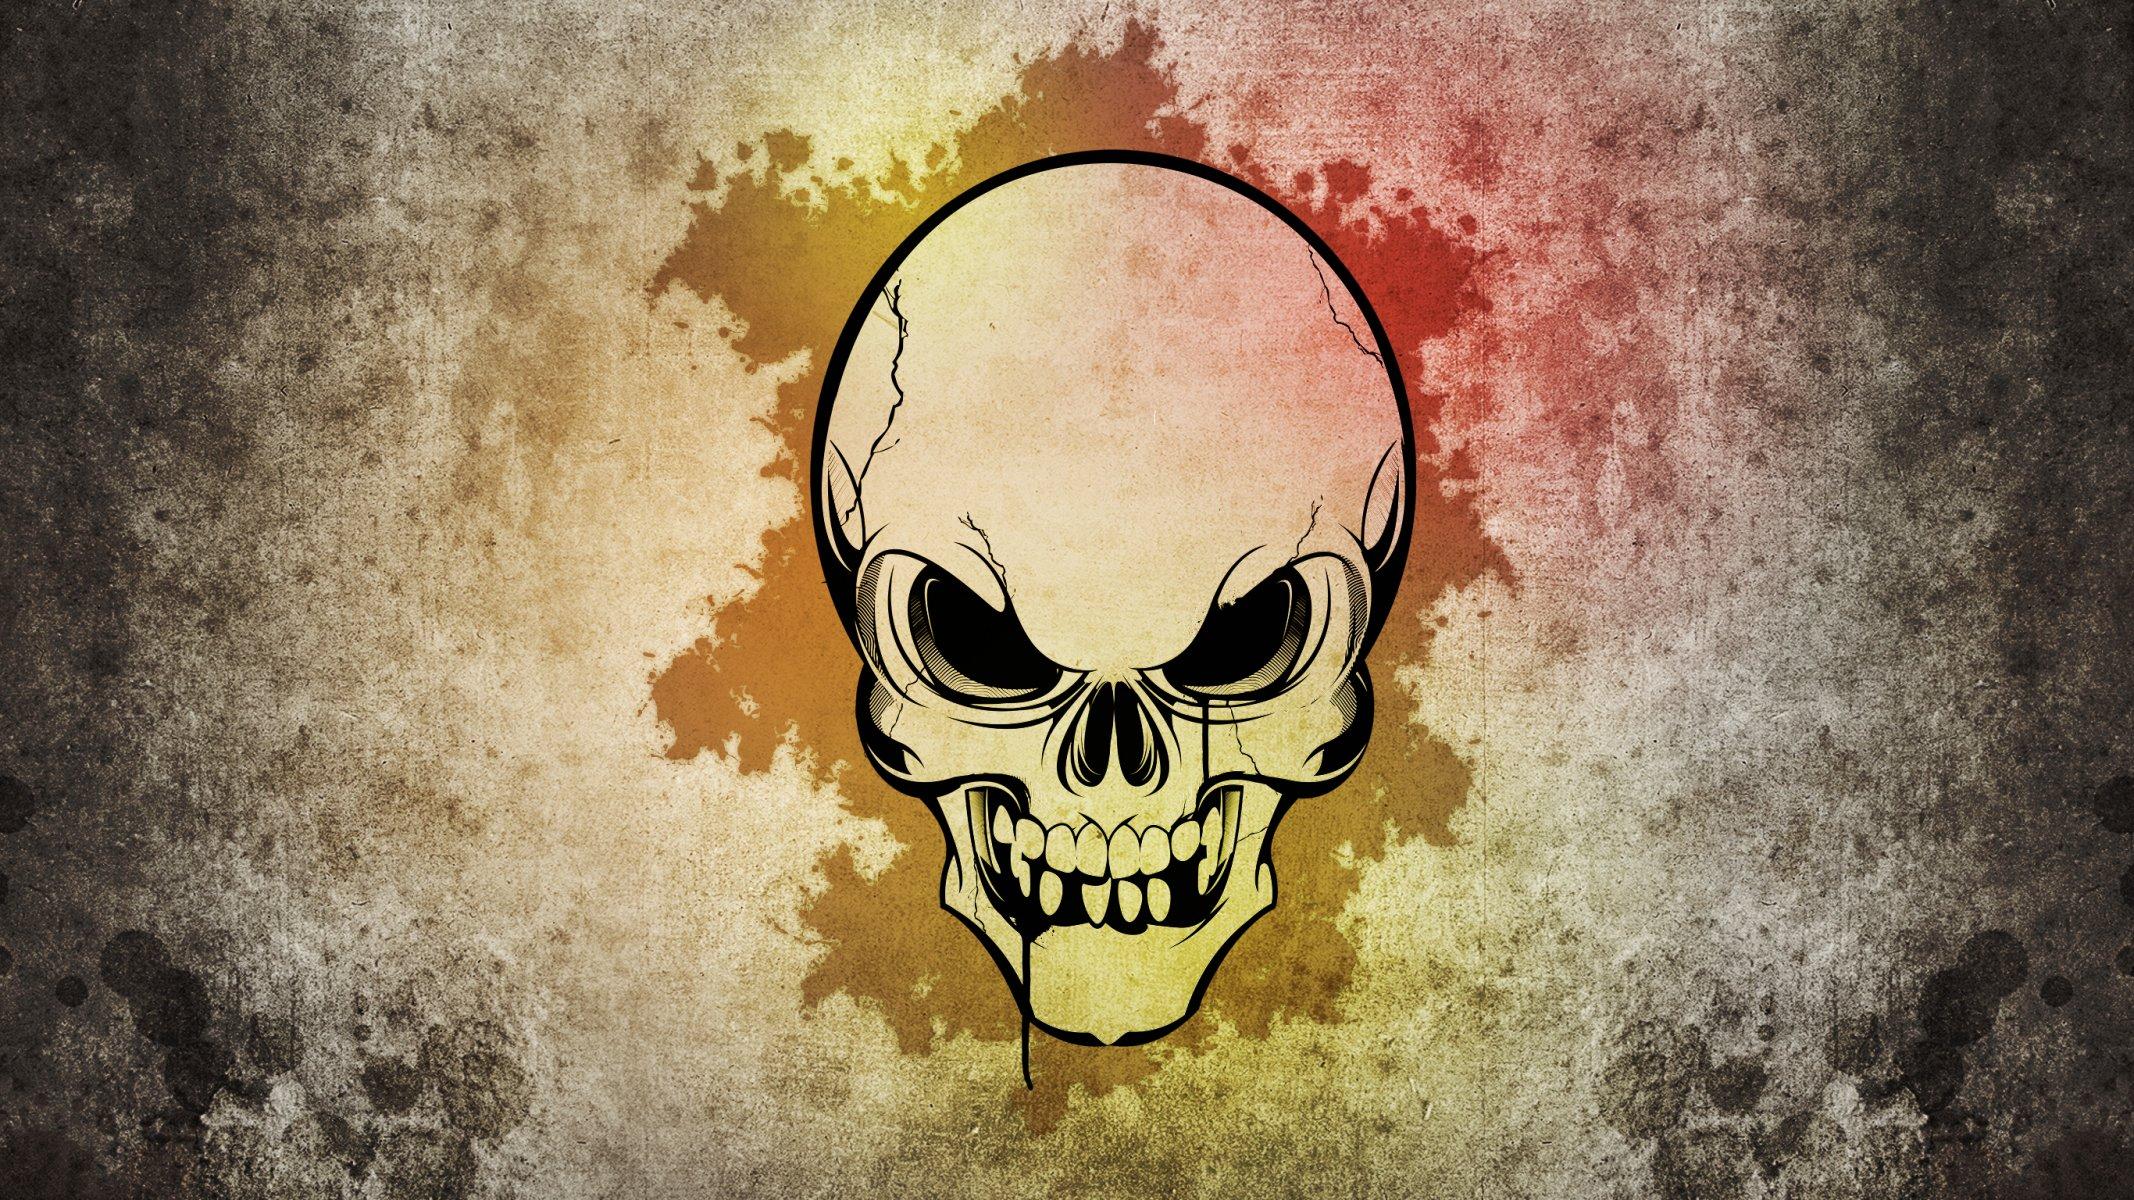 Картинки черепа для авы